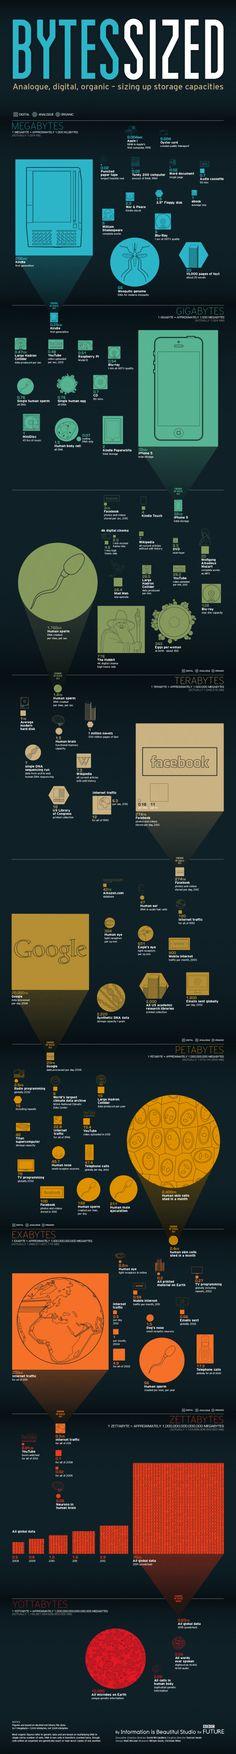 infographic showing storage capacities sizes. Megabytes till Yottabytes